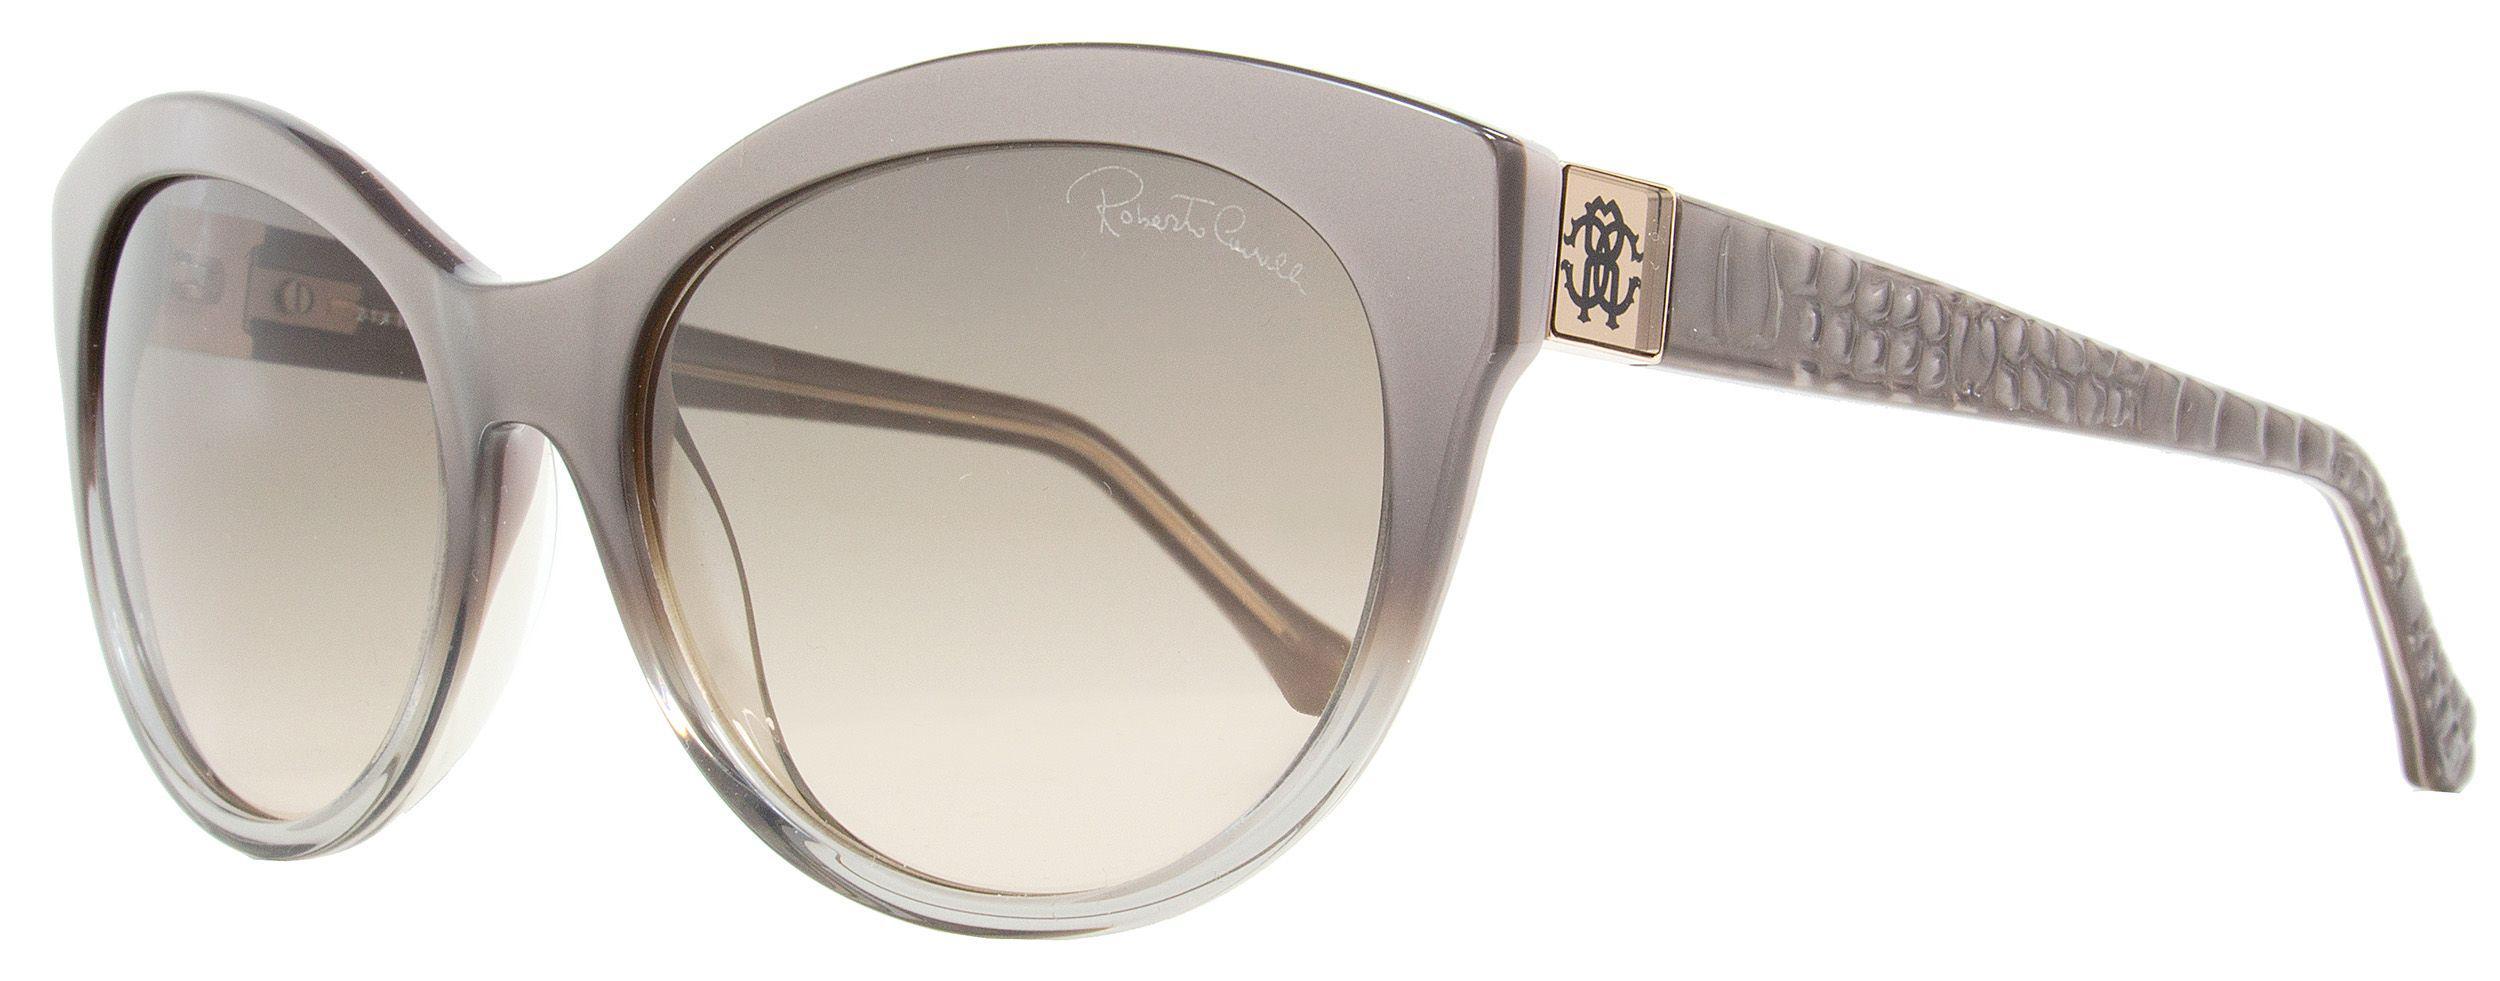 Lyst - Roberto Cavalli Oval Sunglasses Rc798s Albaldah 20b Pearl ... 0e1fec291e